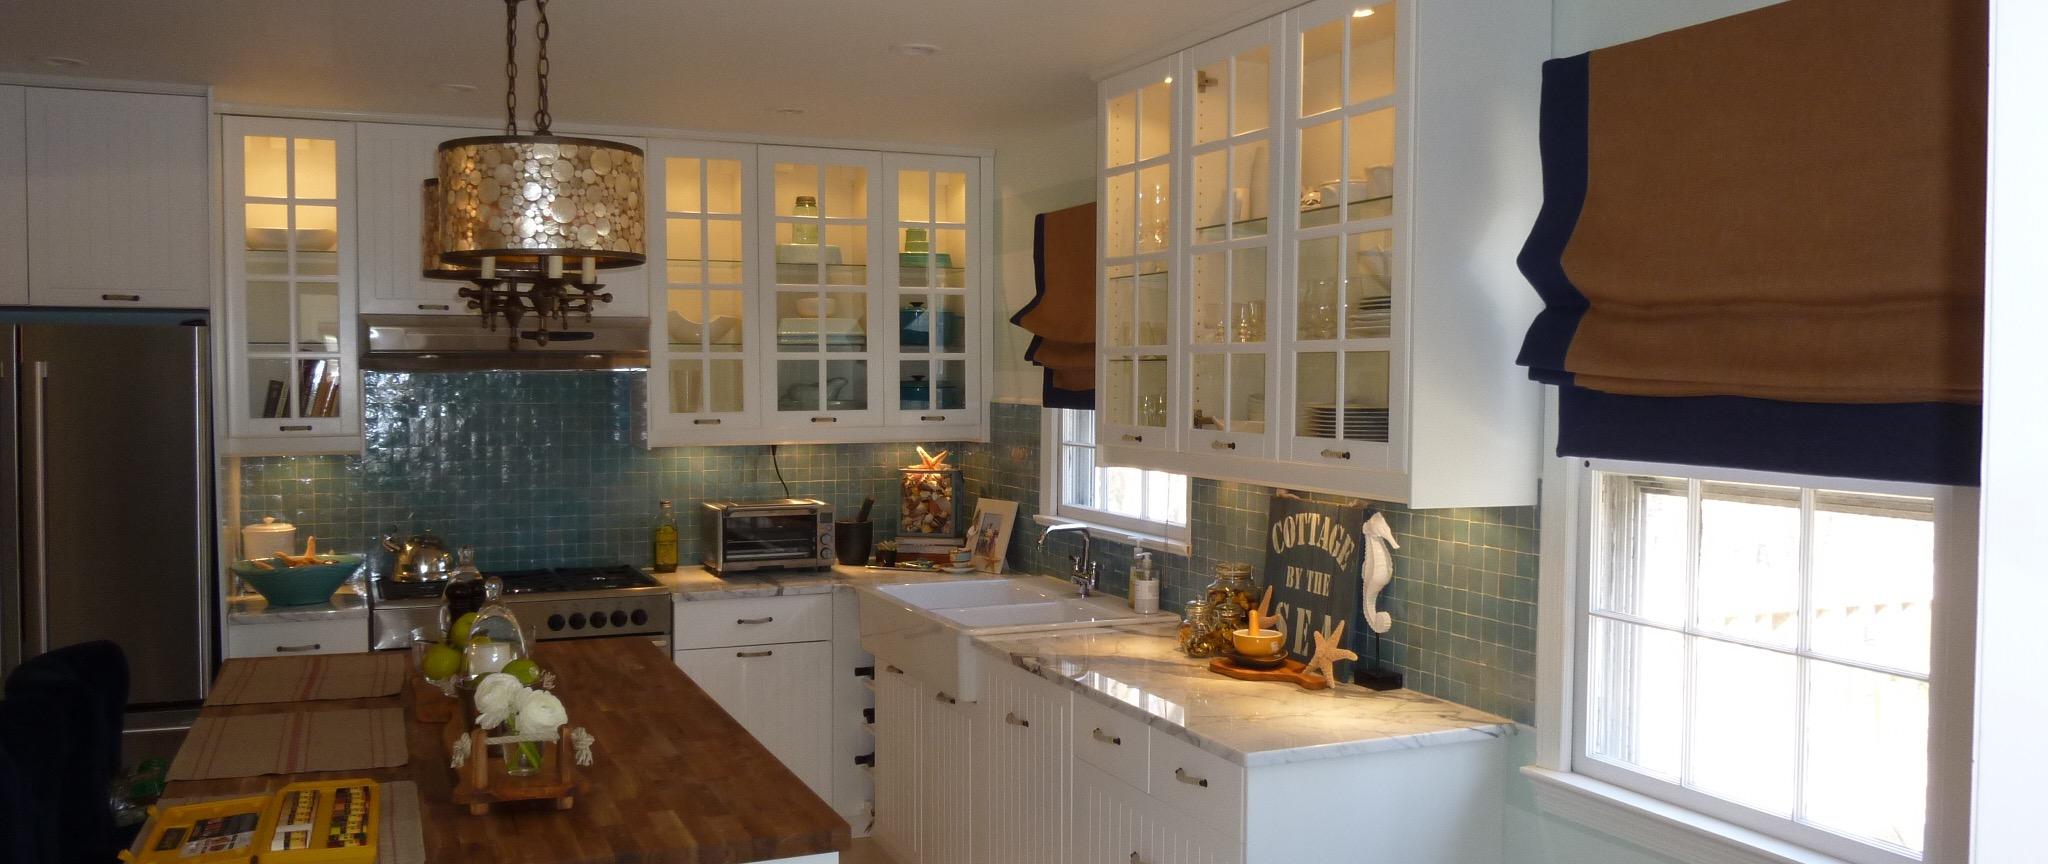 kitchen remodeling nj bathroom design new jersey kitchen & bath